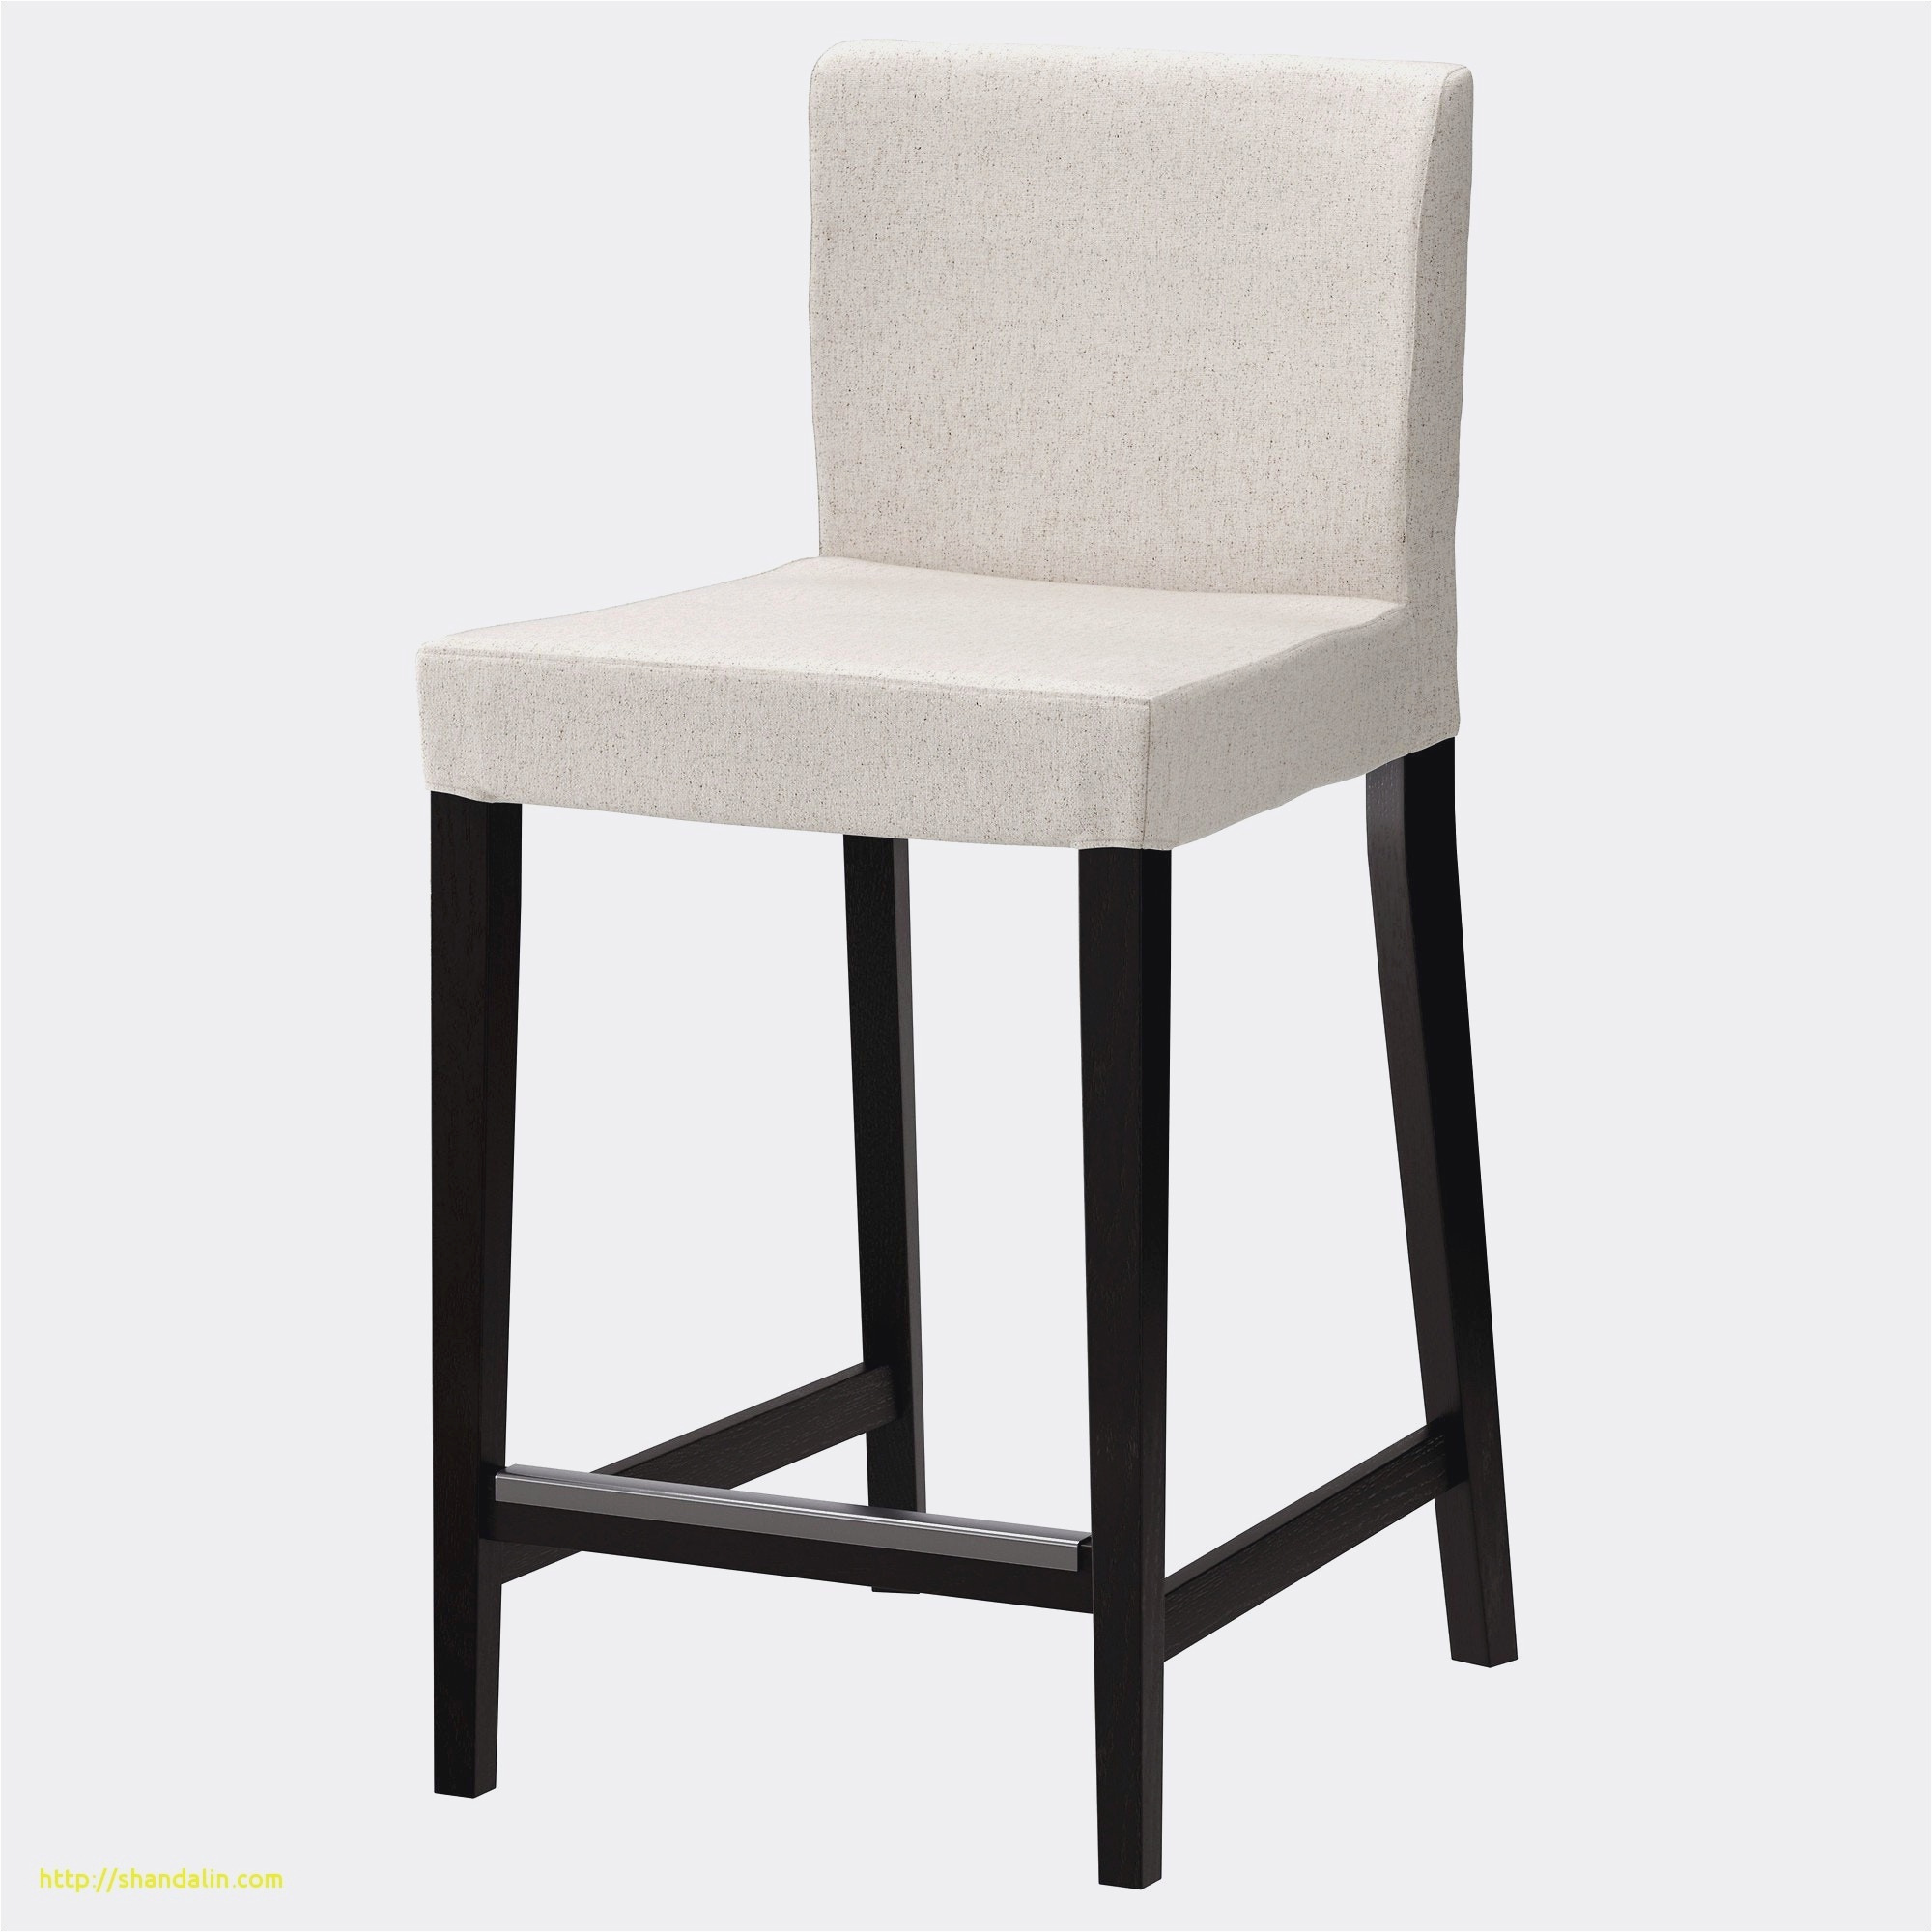 chaise haute transparente luxe chaises transparentes but luxe chaise haute but alinea chaise 0d of chaise haute transparente 1